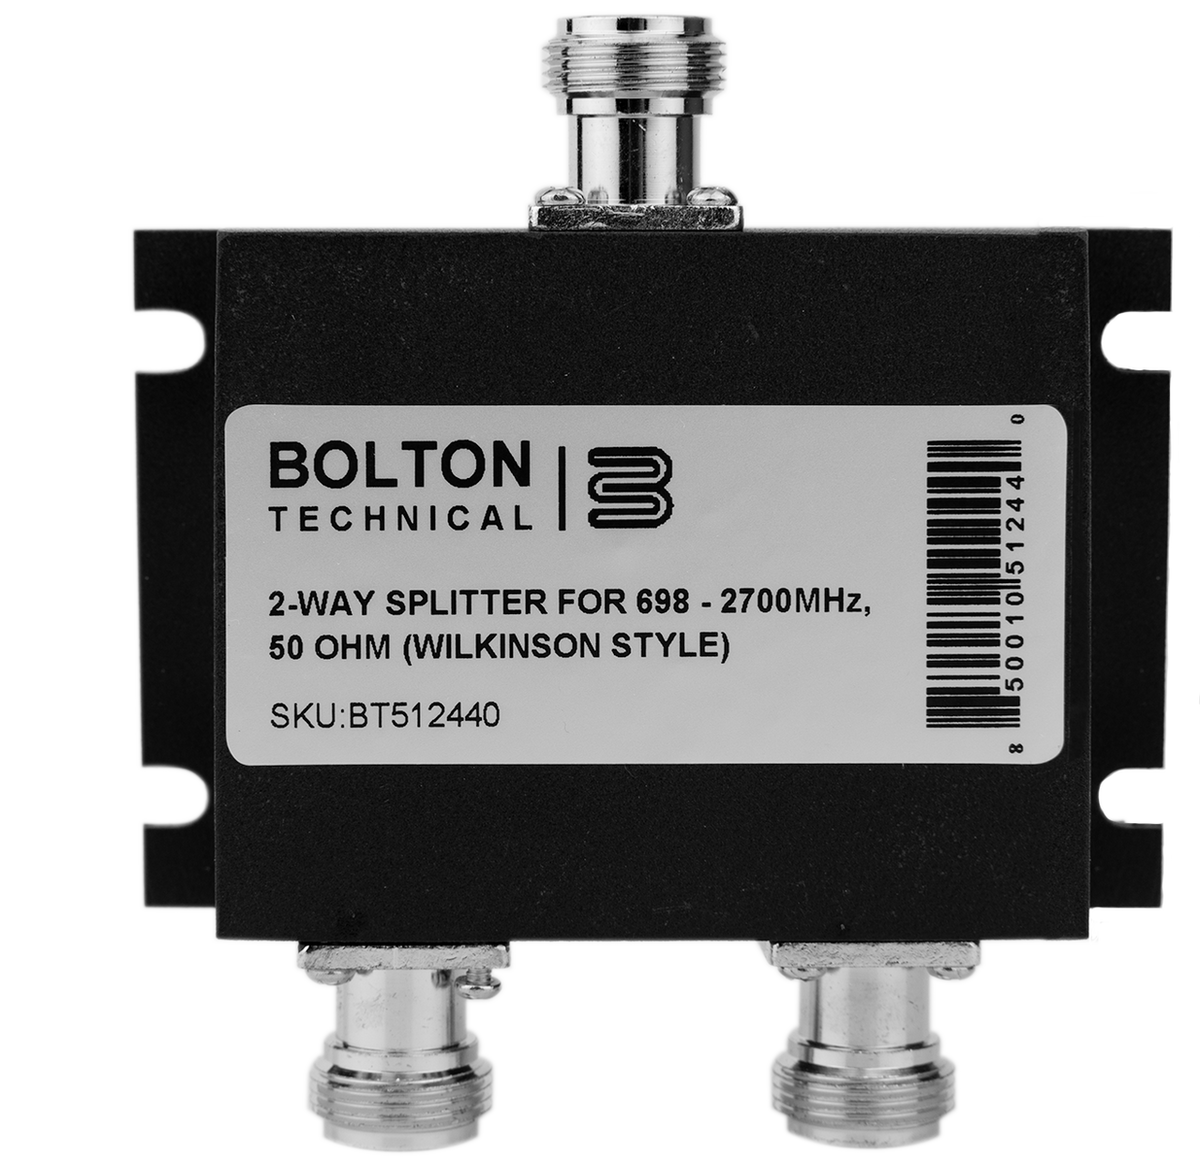 Bolton Technical Low-PIM 2-Way Splitter 698-2700Mhz 50 Ohm  (Wilkinson Style)